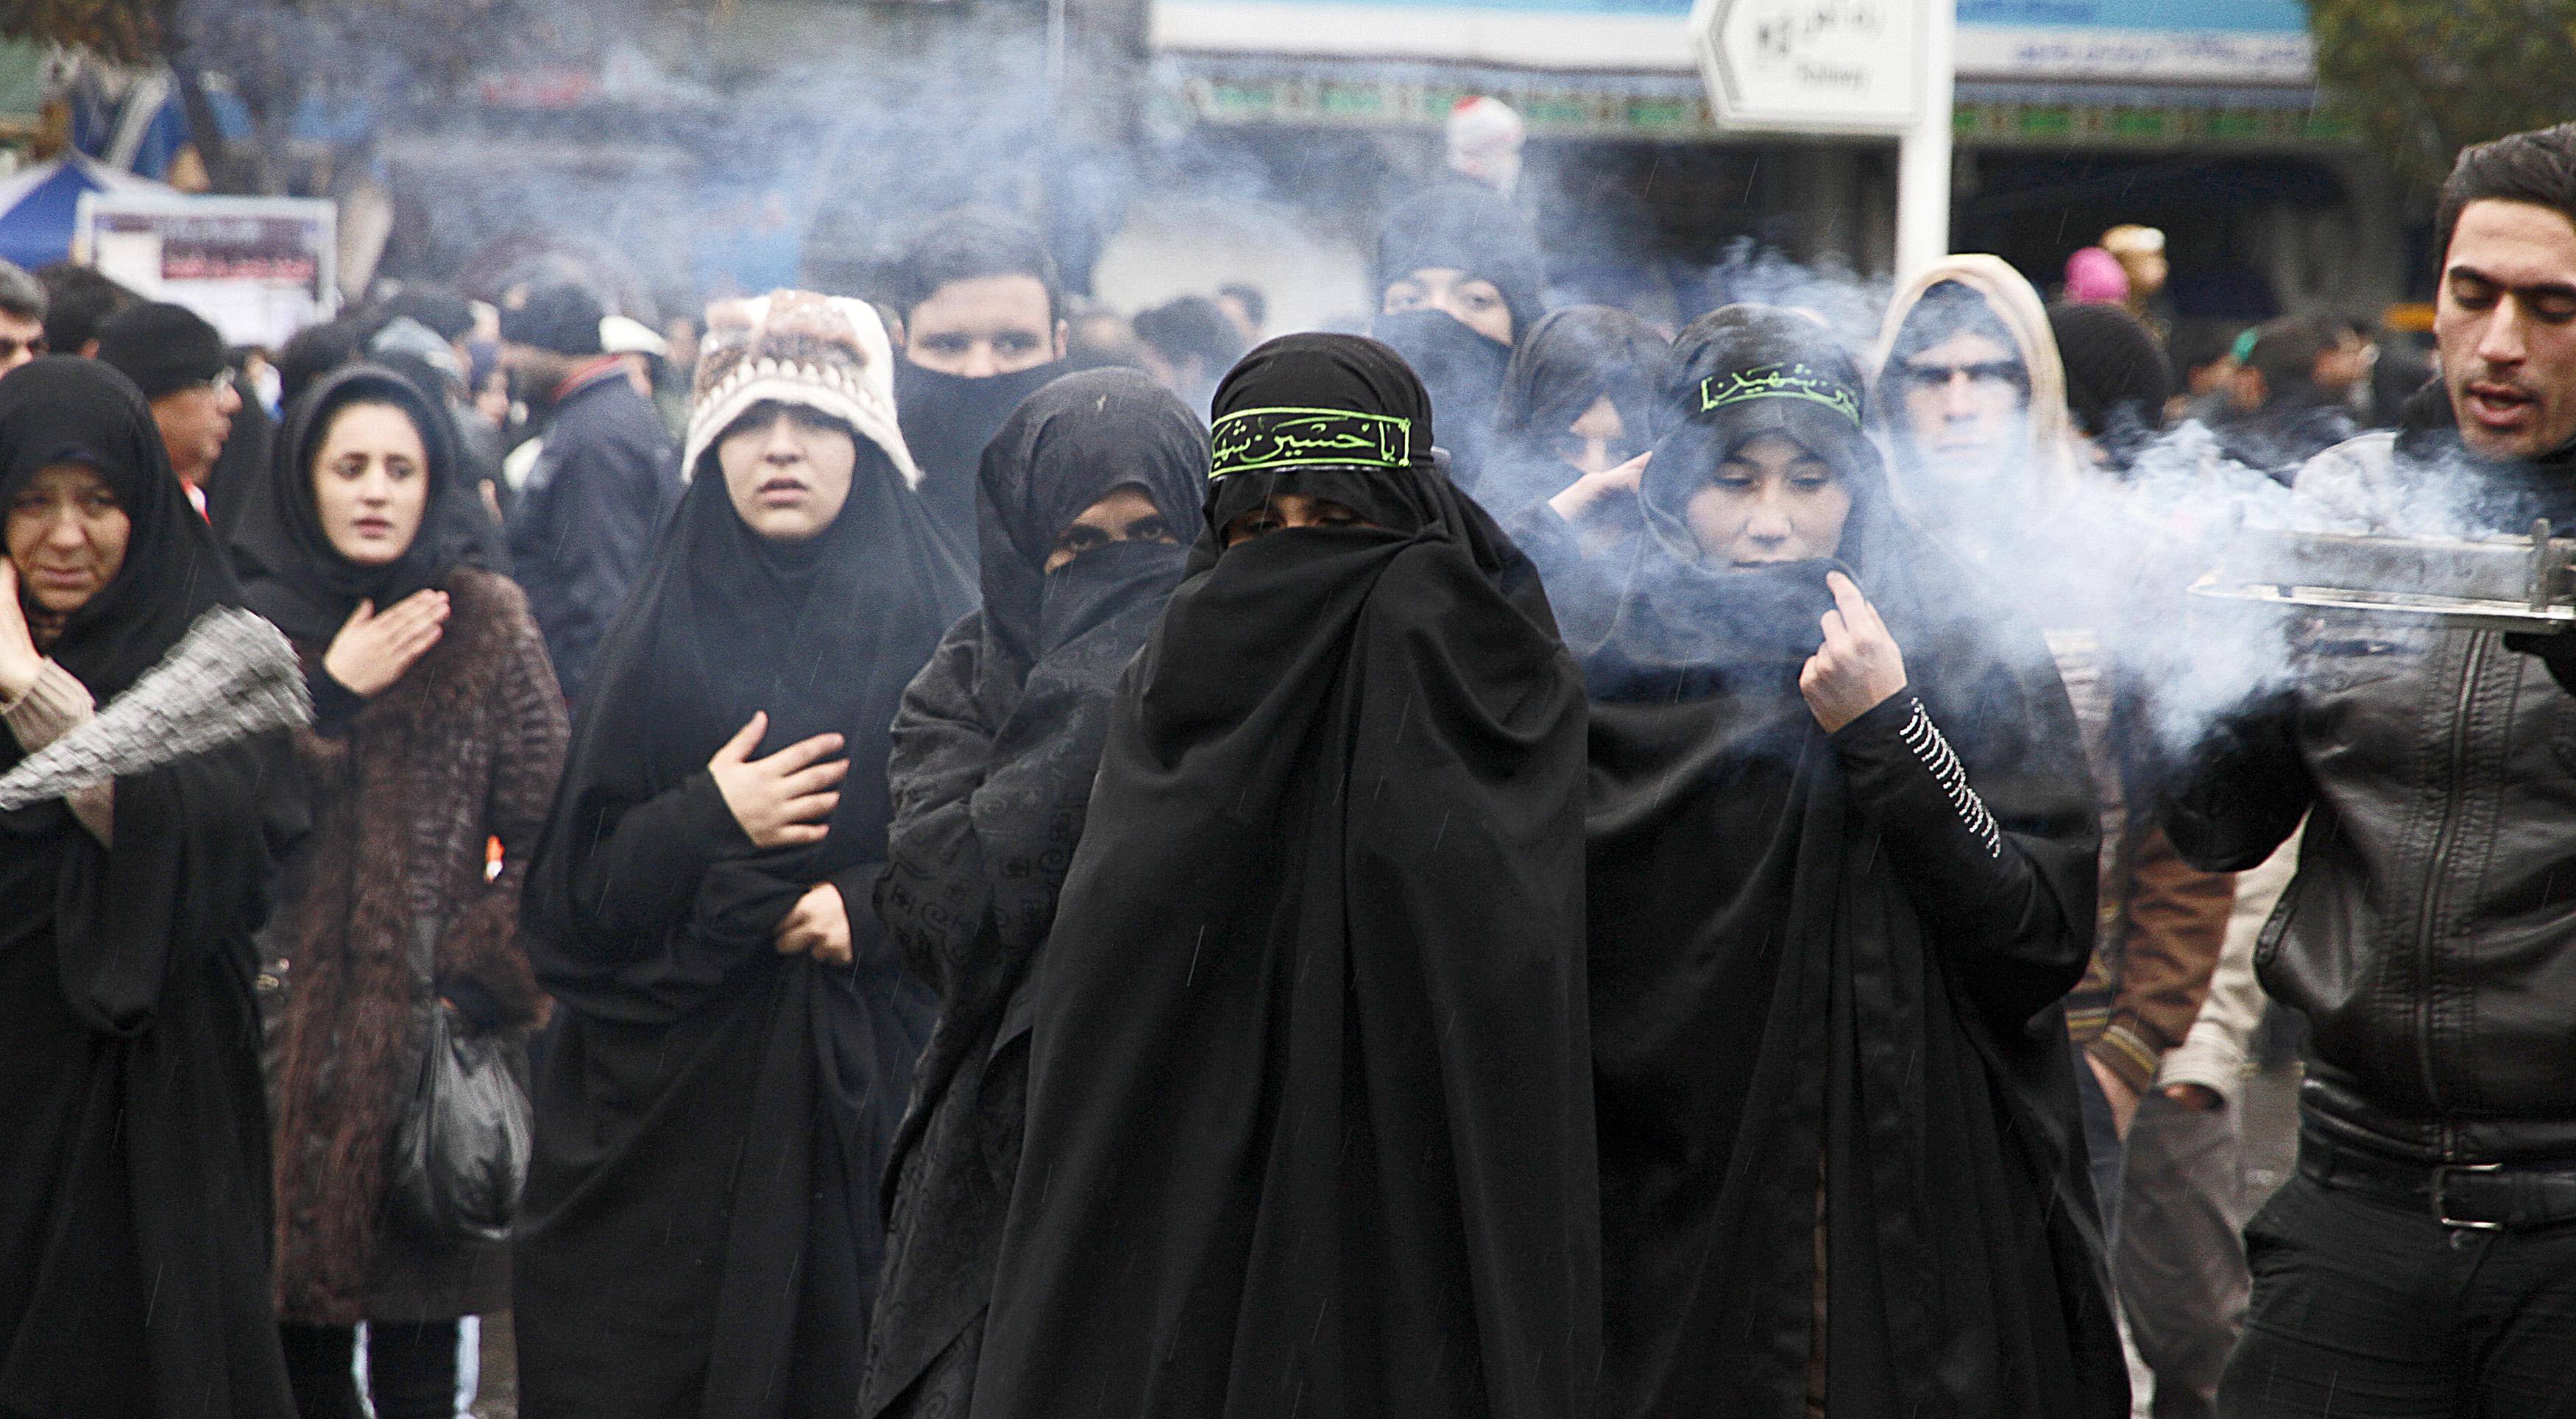 Iran : la persécution silencieuse des minorités religieuses